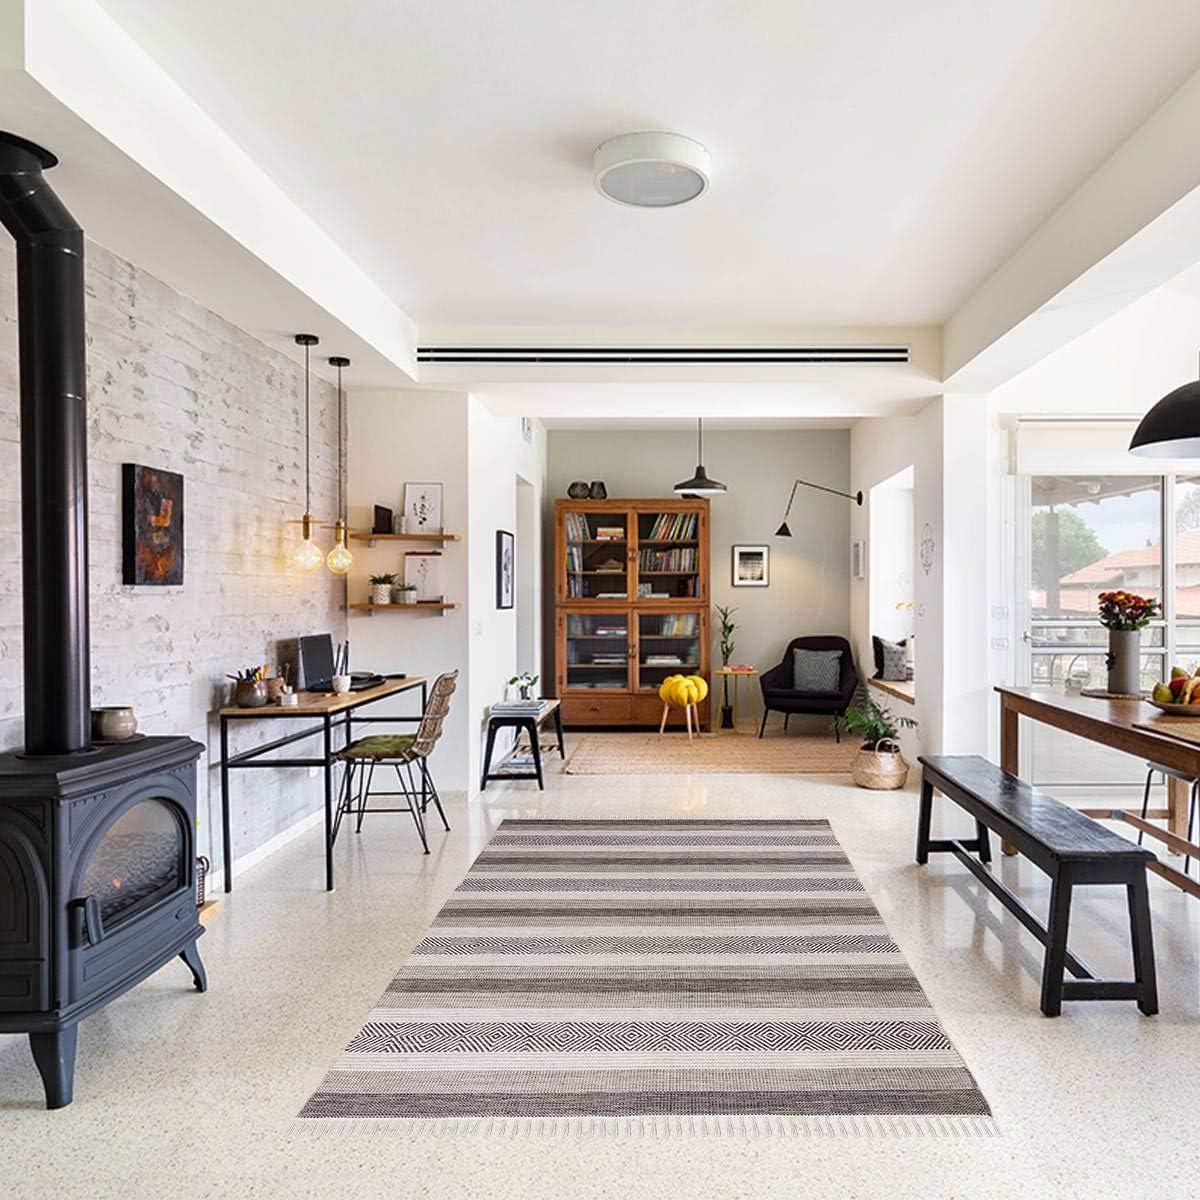 We Rugs Beautiful Area Rugs for Living Room Decor, Modern Geometric Handmade Area Rug, Grey 9 x 12